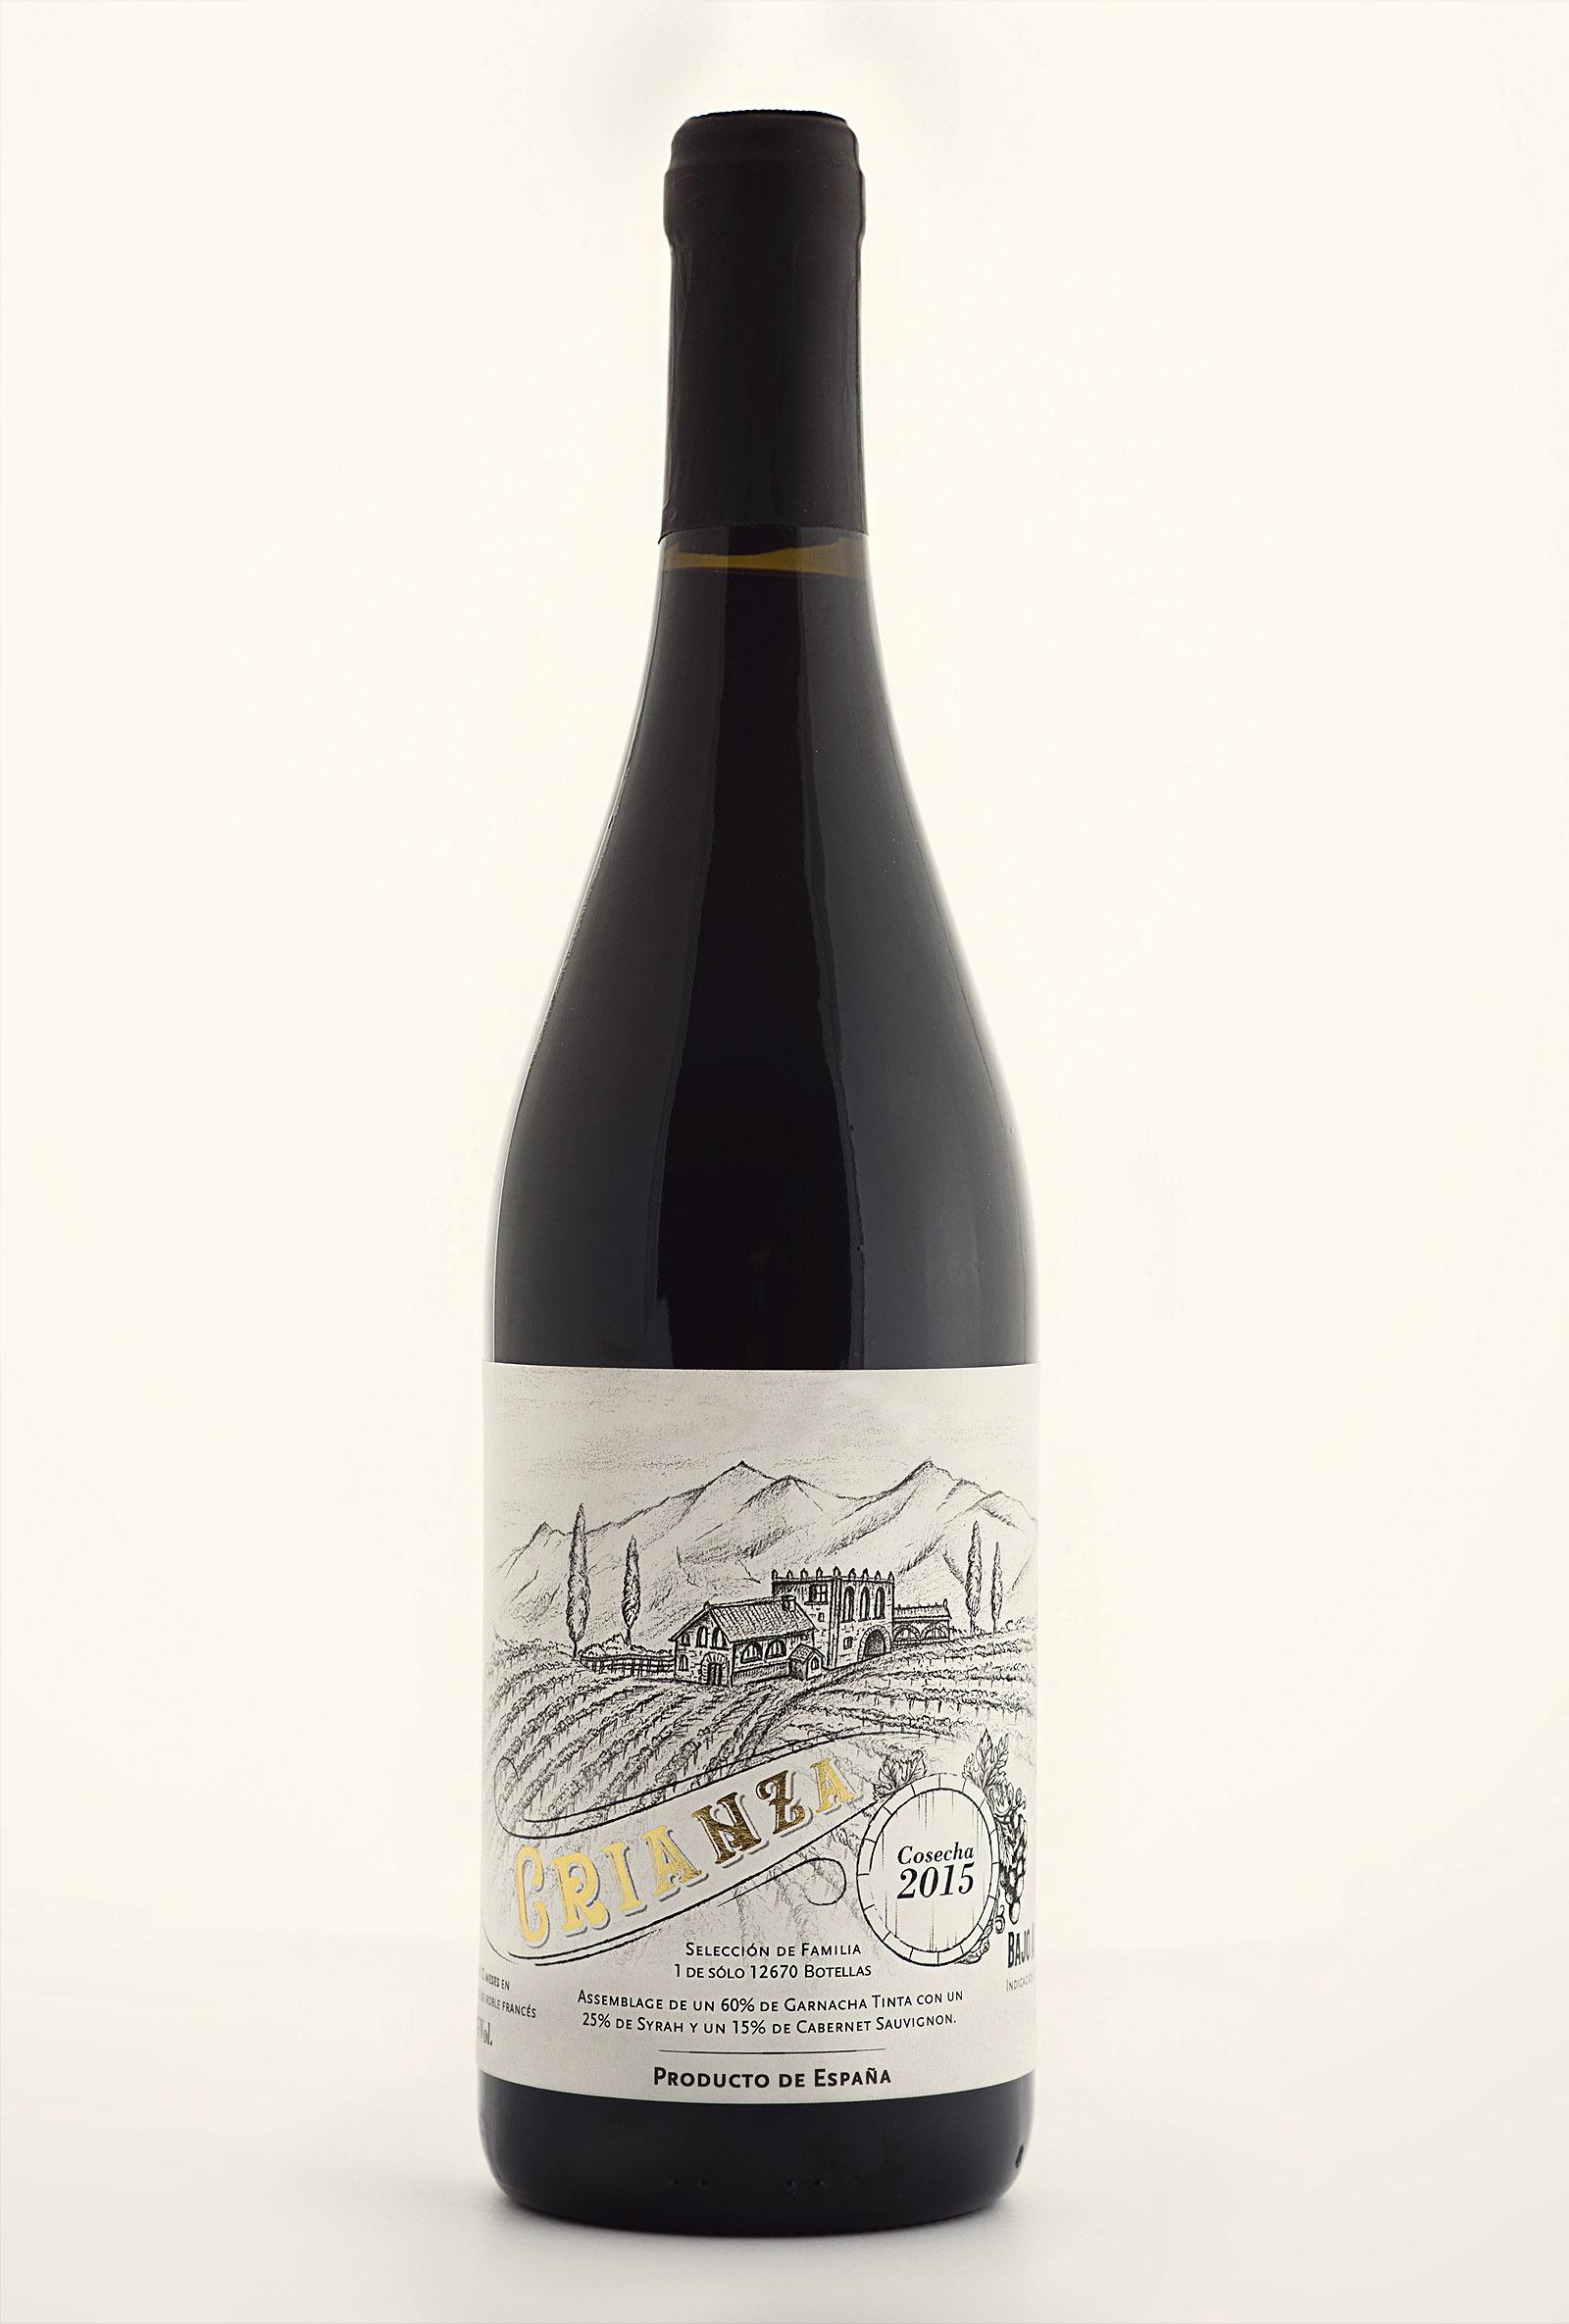 Vino Crianza, Diseño de etiqueta de Vino, Packaging para vino, etiqueta artesanal, etiqueta dibujada a mano